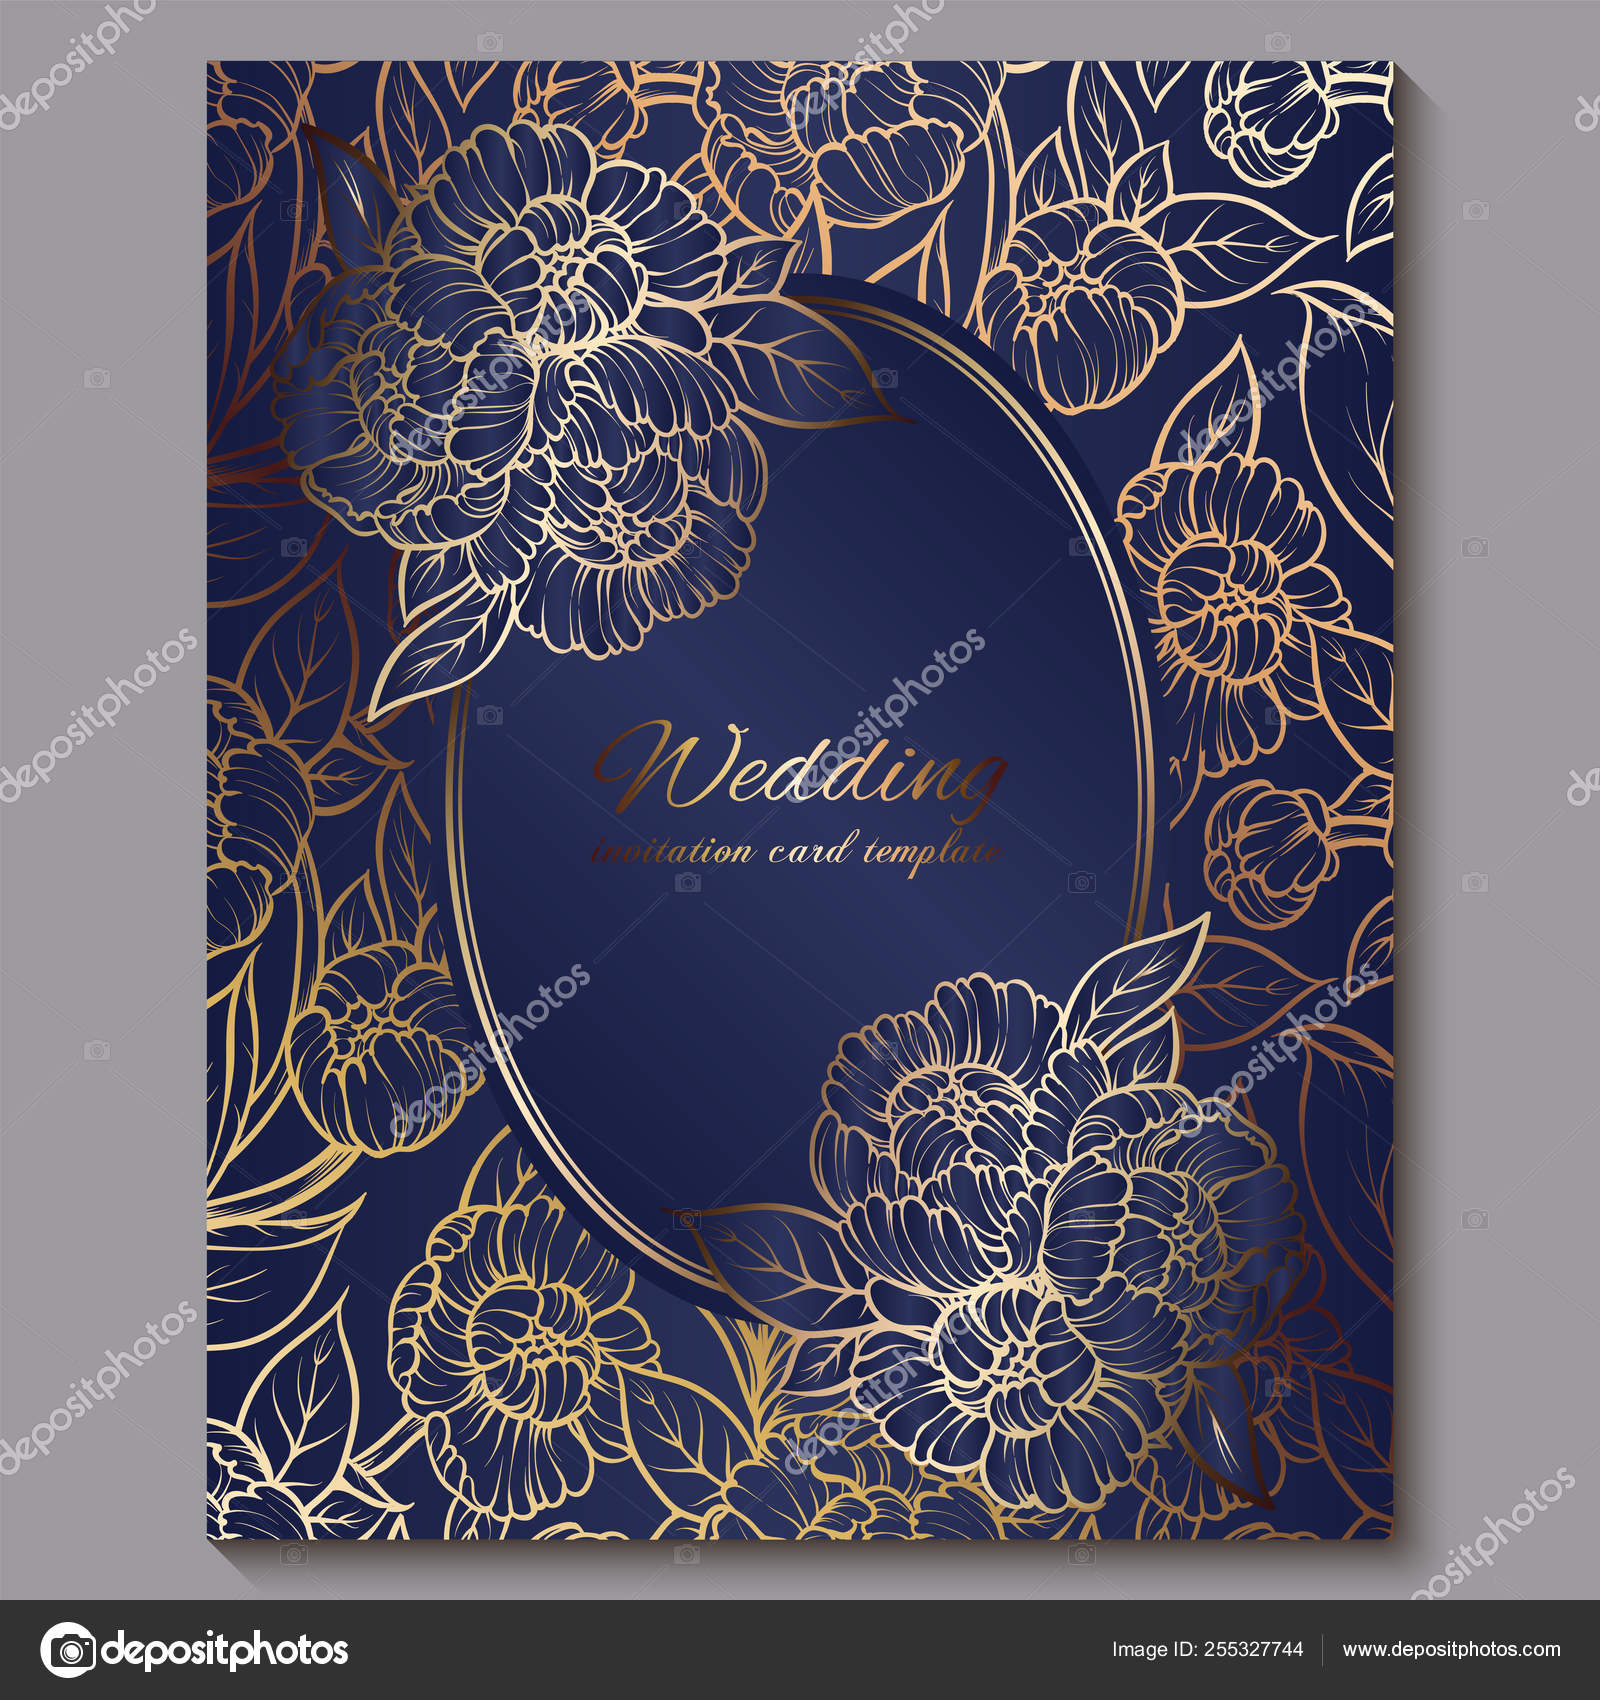 Exquisite Royal Luxury Wedding Invitation Gold On Blue